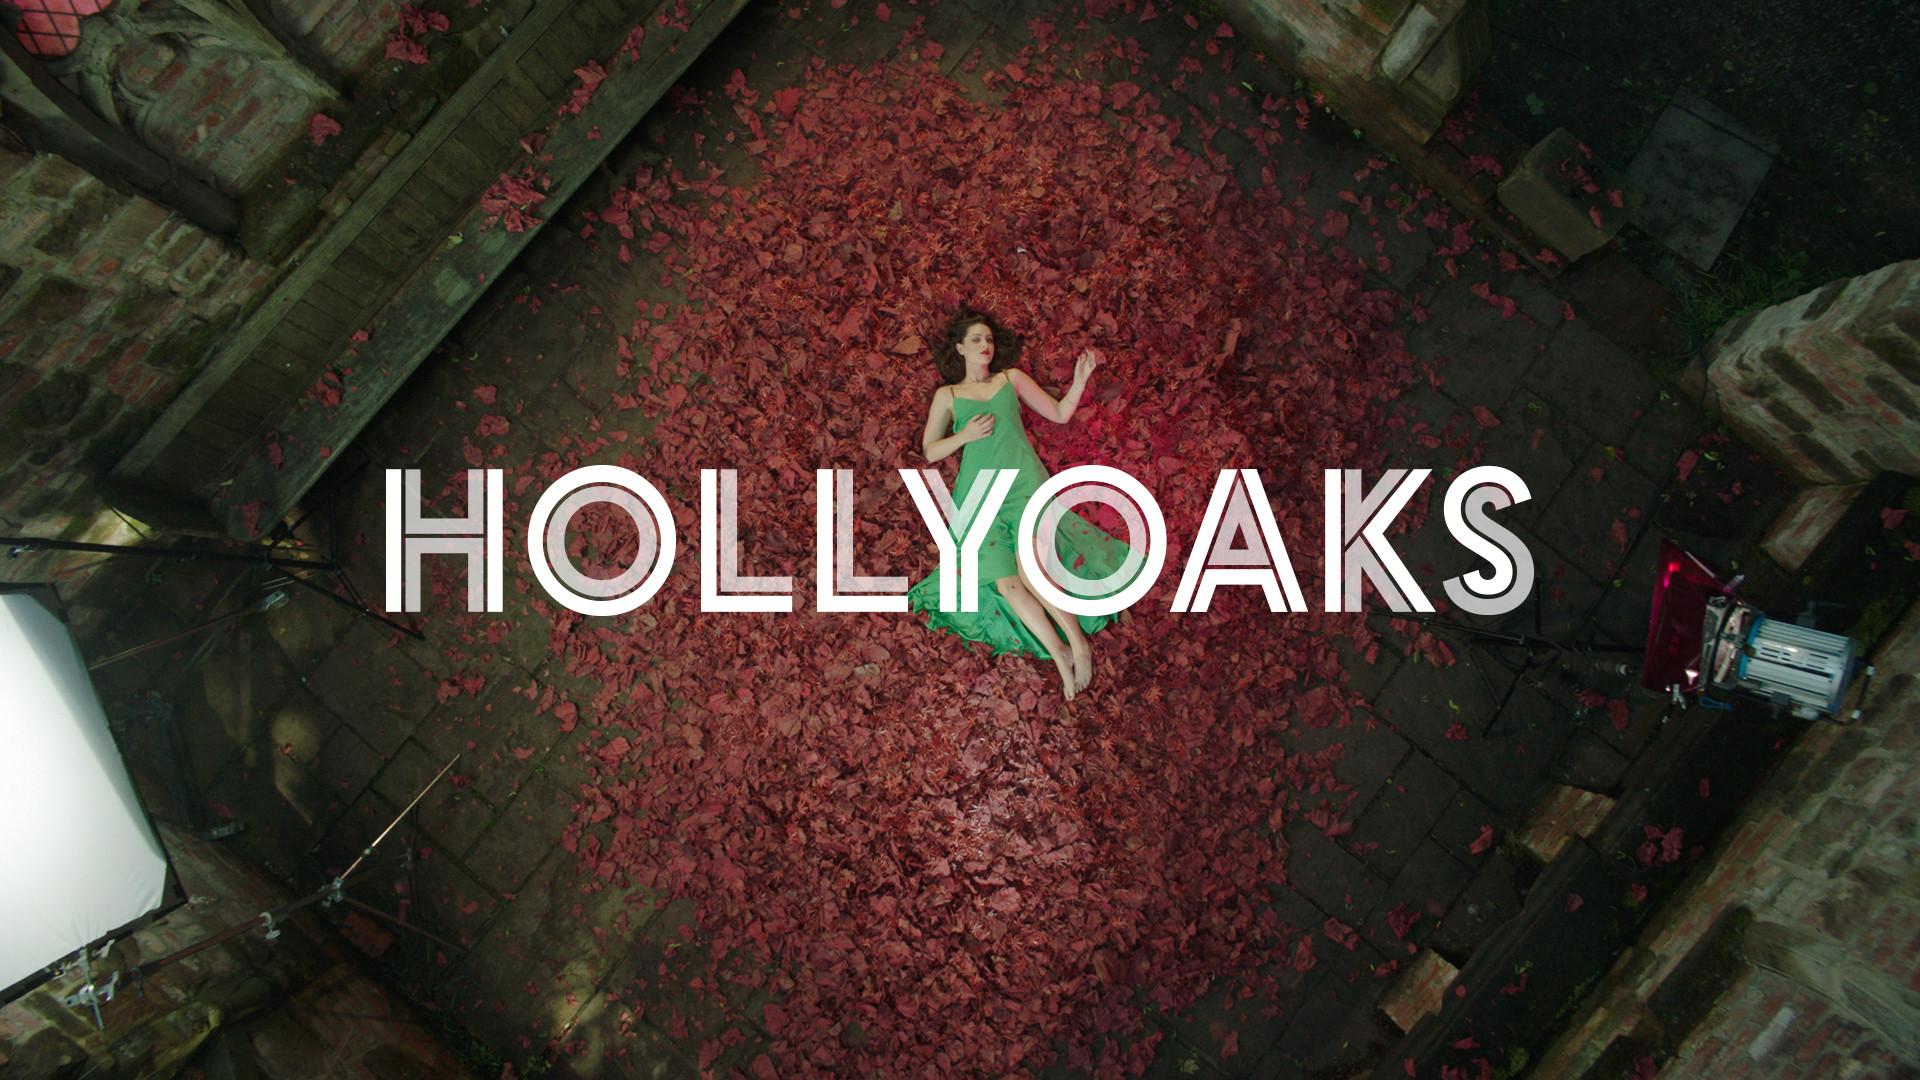 Hollyoaks-Sienna1.jpg